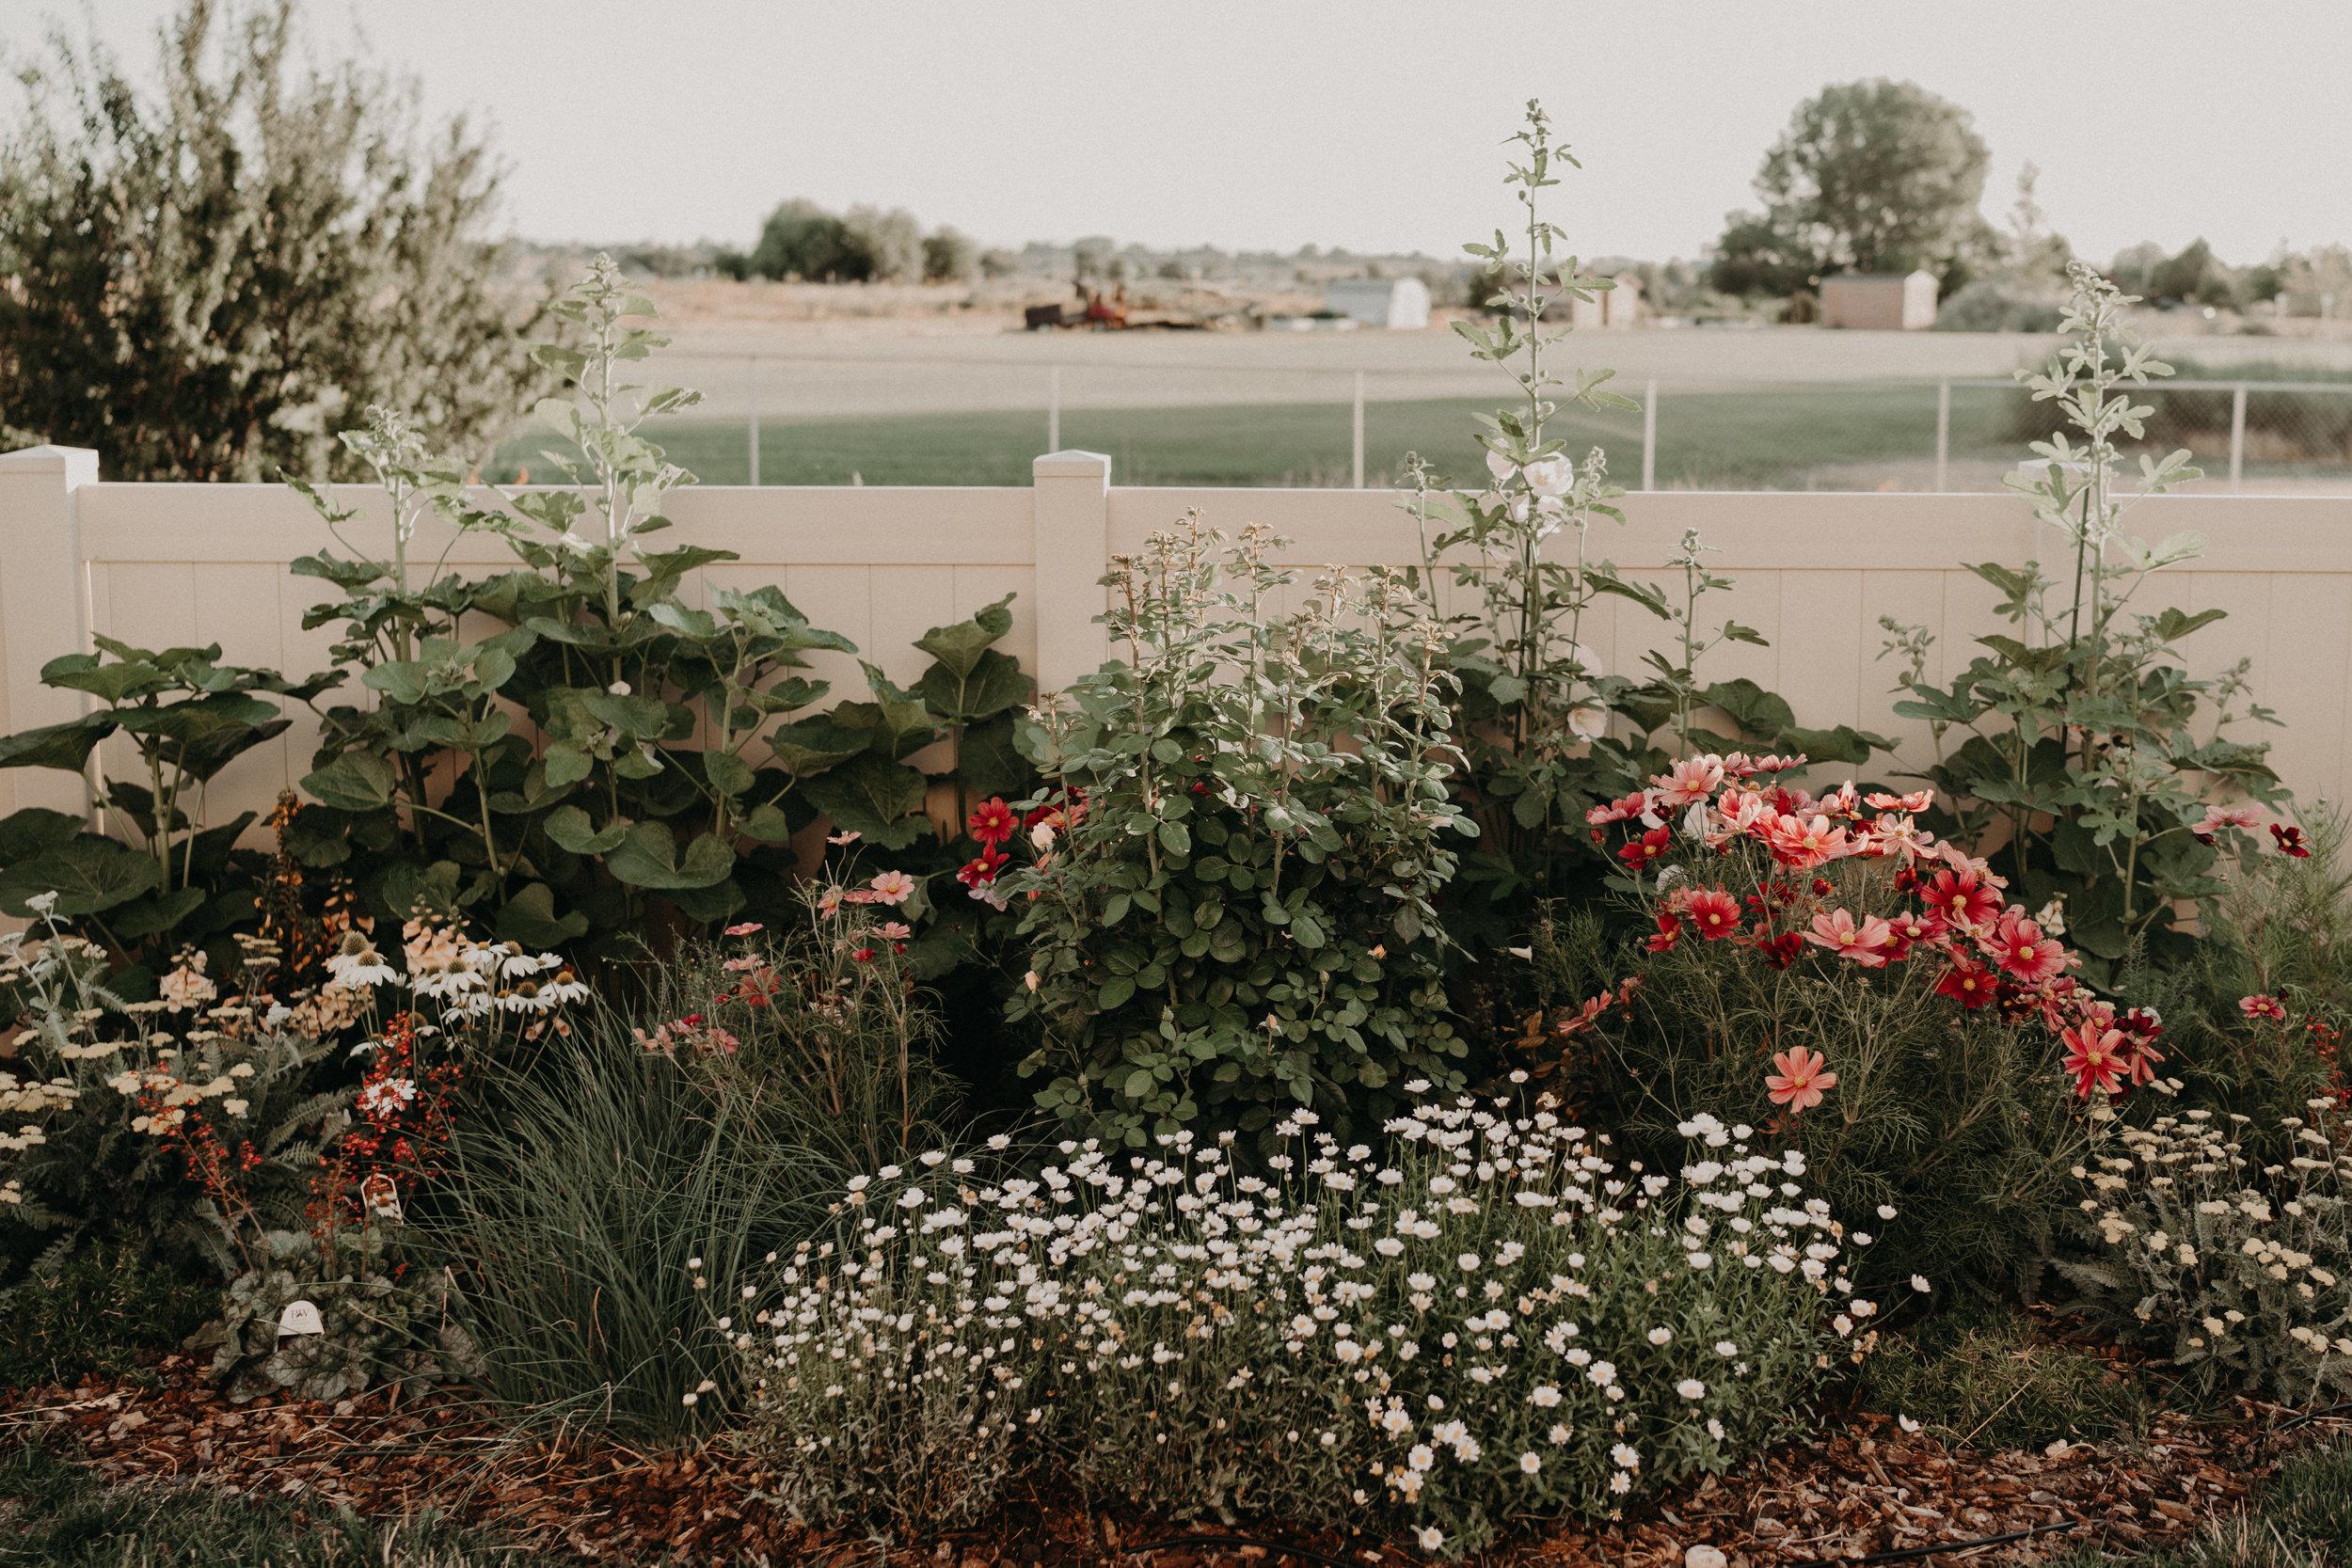 Boise senior photographer Makayla Madden Garden English Cottage Garden Design Ideas Summer Border Pink Yellow Roses Yarrow Rubinato Cosmos Hollyhocks Idaho landscaping green thumb gardening 101